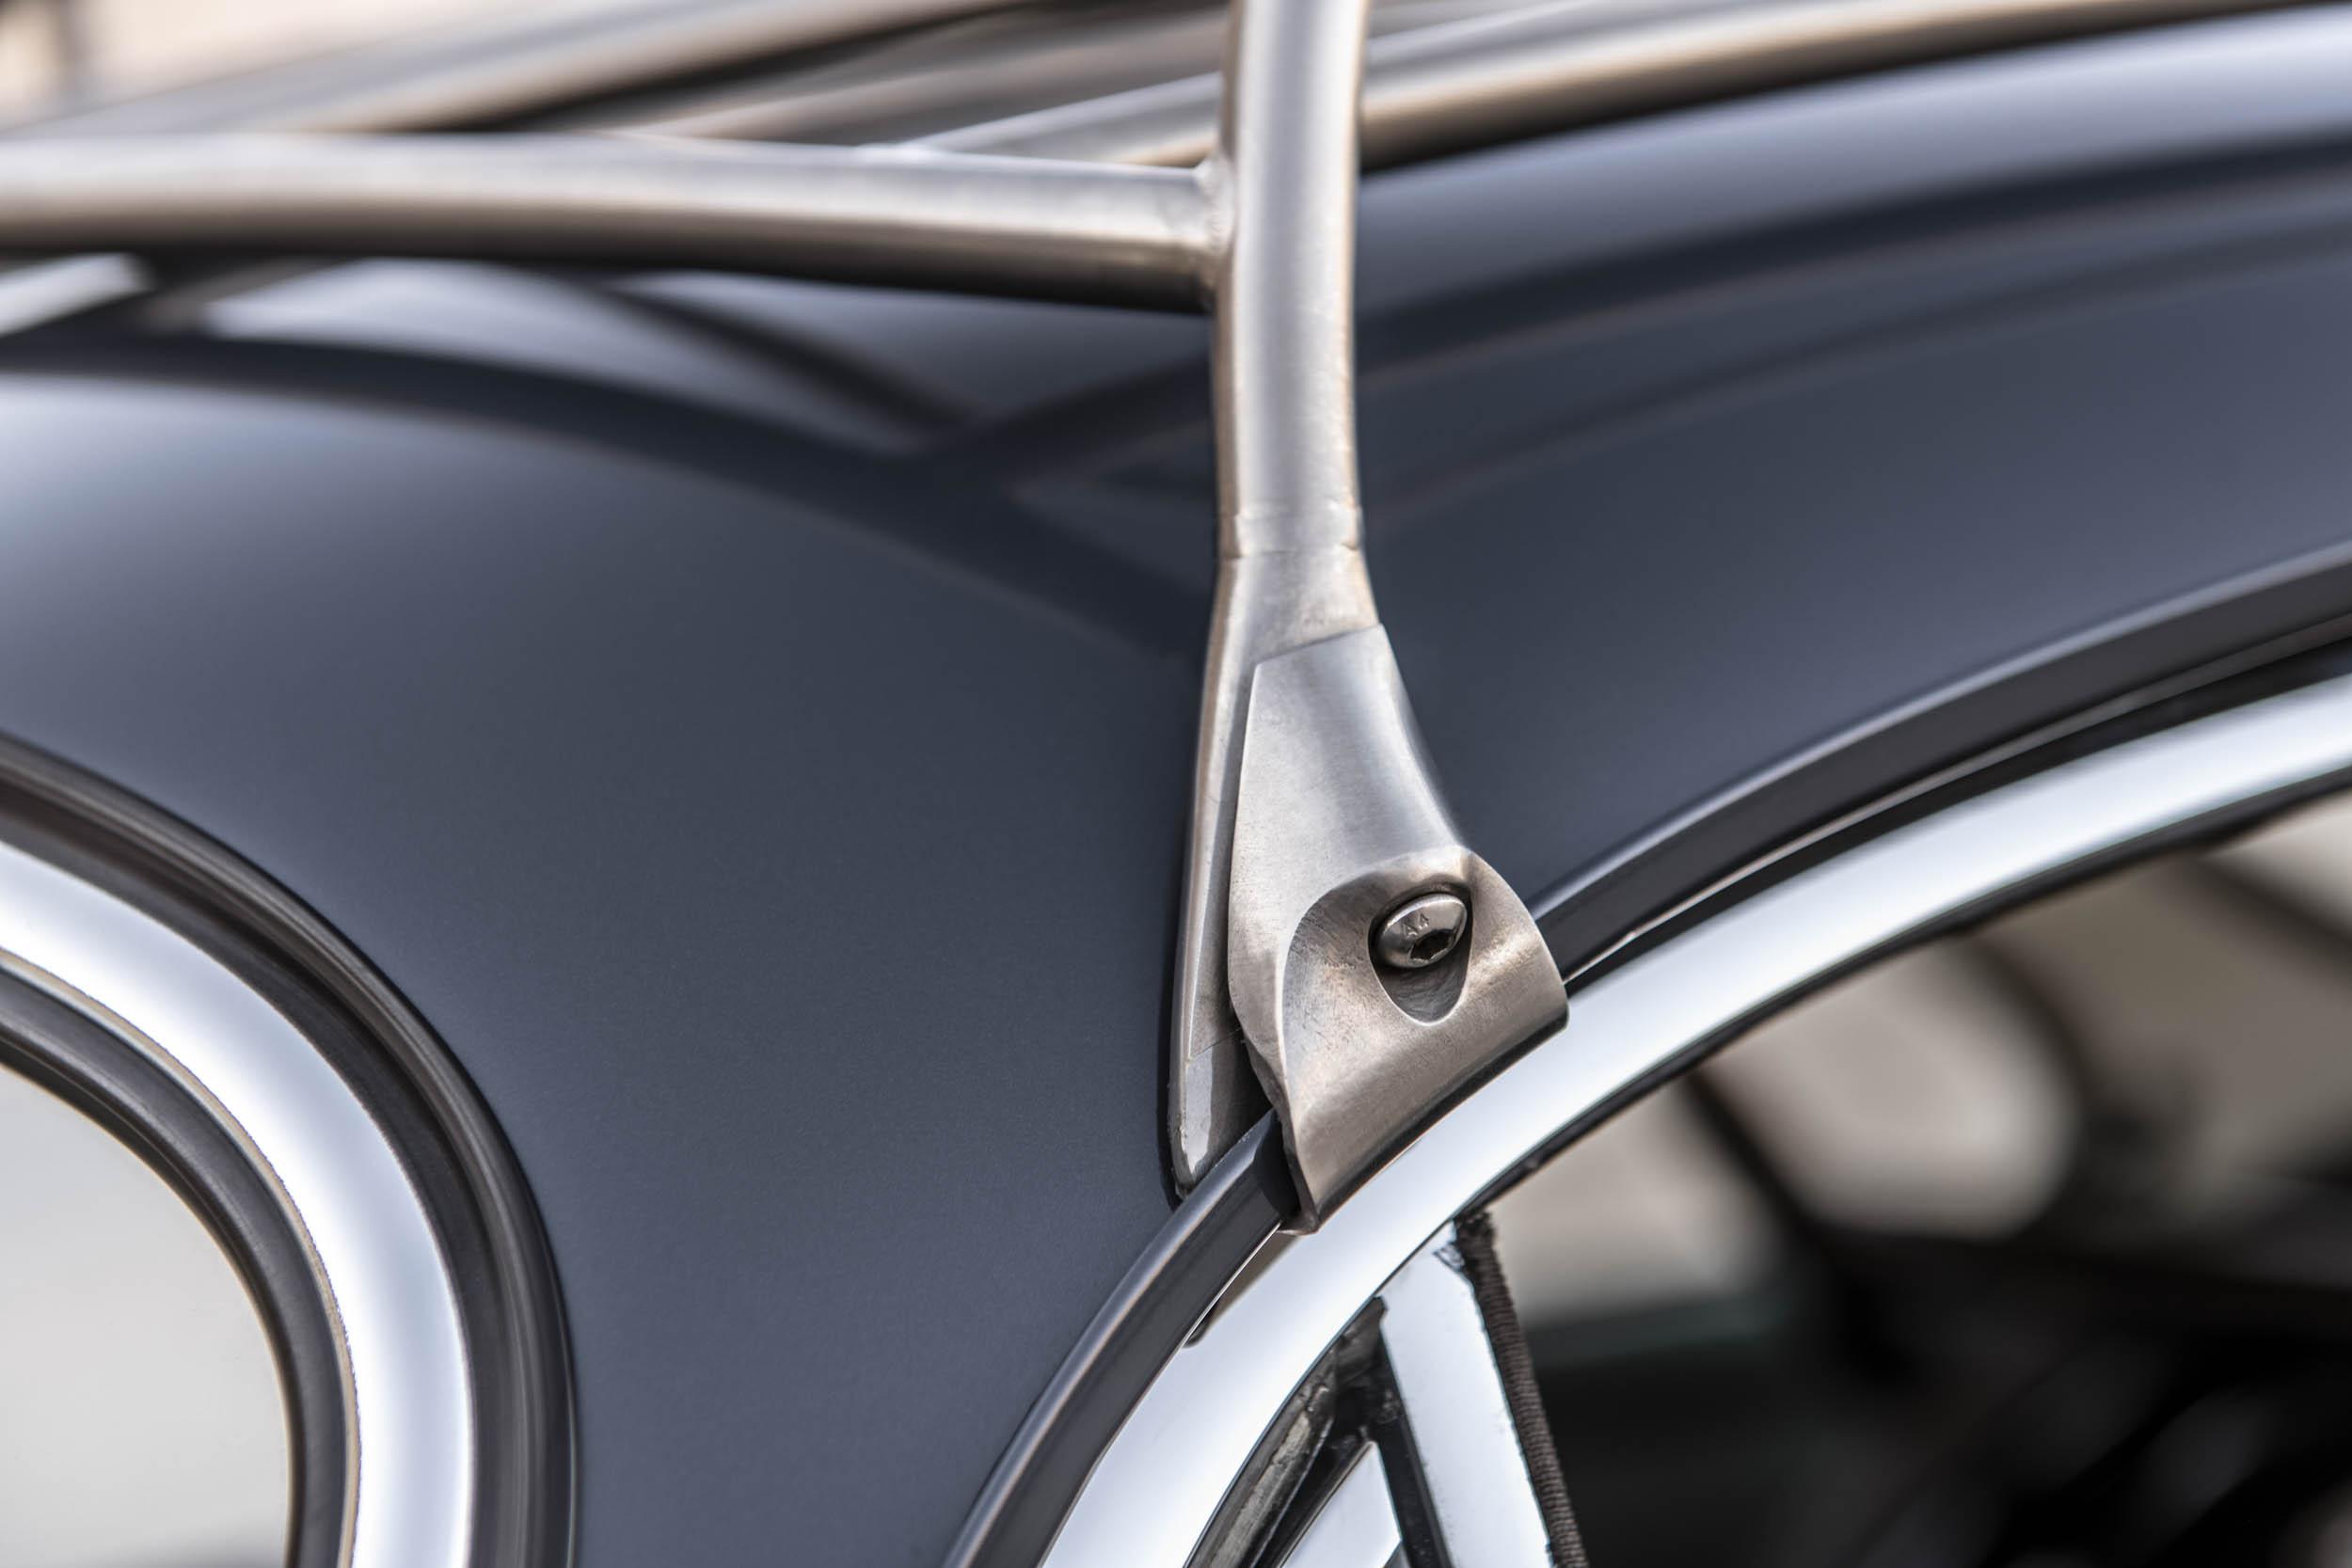 Emory Porsche 356 C4S Allrad roof mount